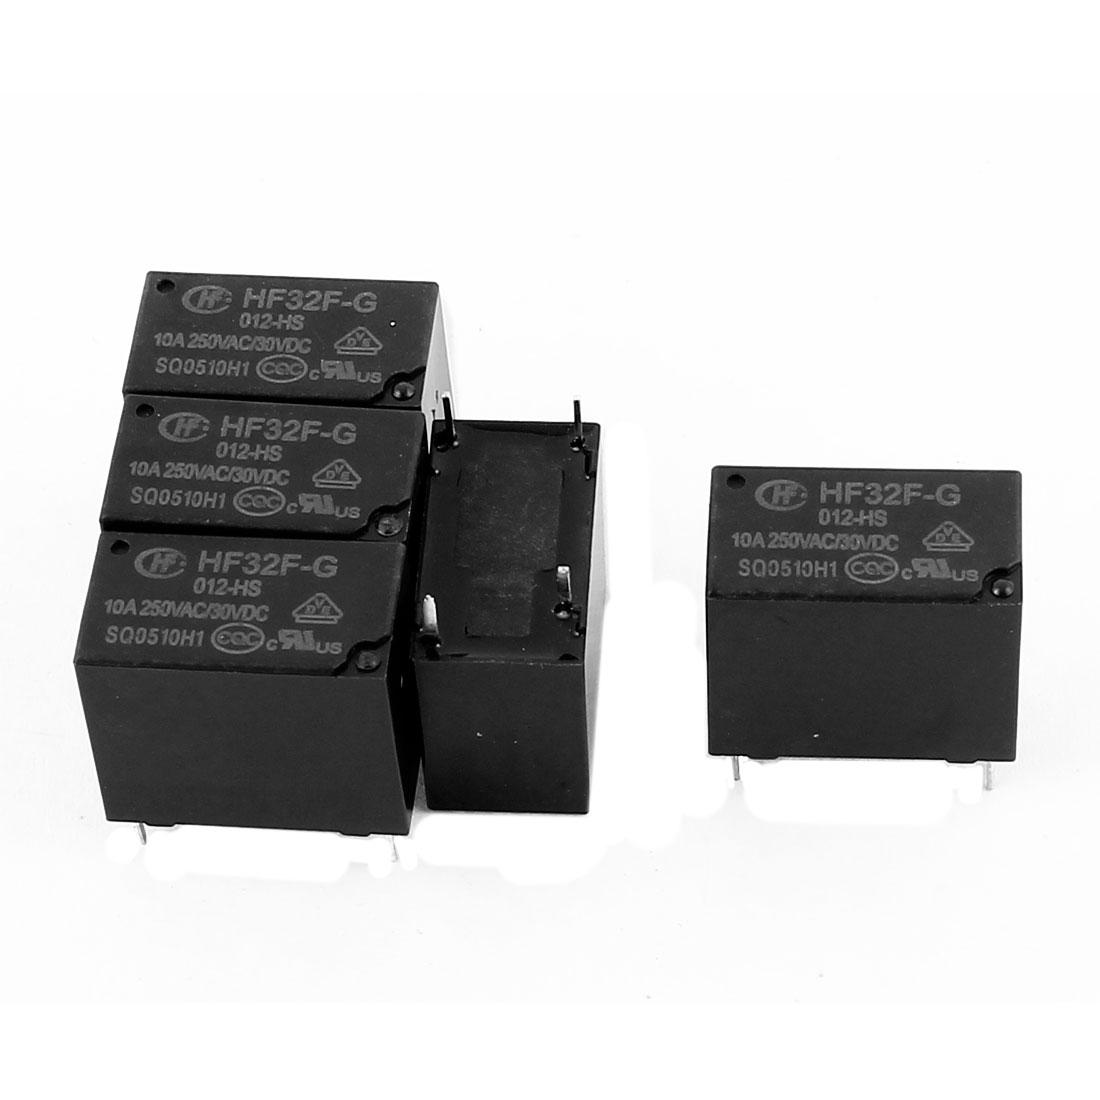 5 Pcs 30VDC 250VAC 10A 4 Terminal NO SPST HF32F-G/012-HS Power Relay